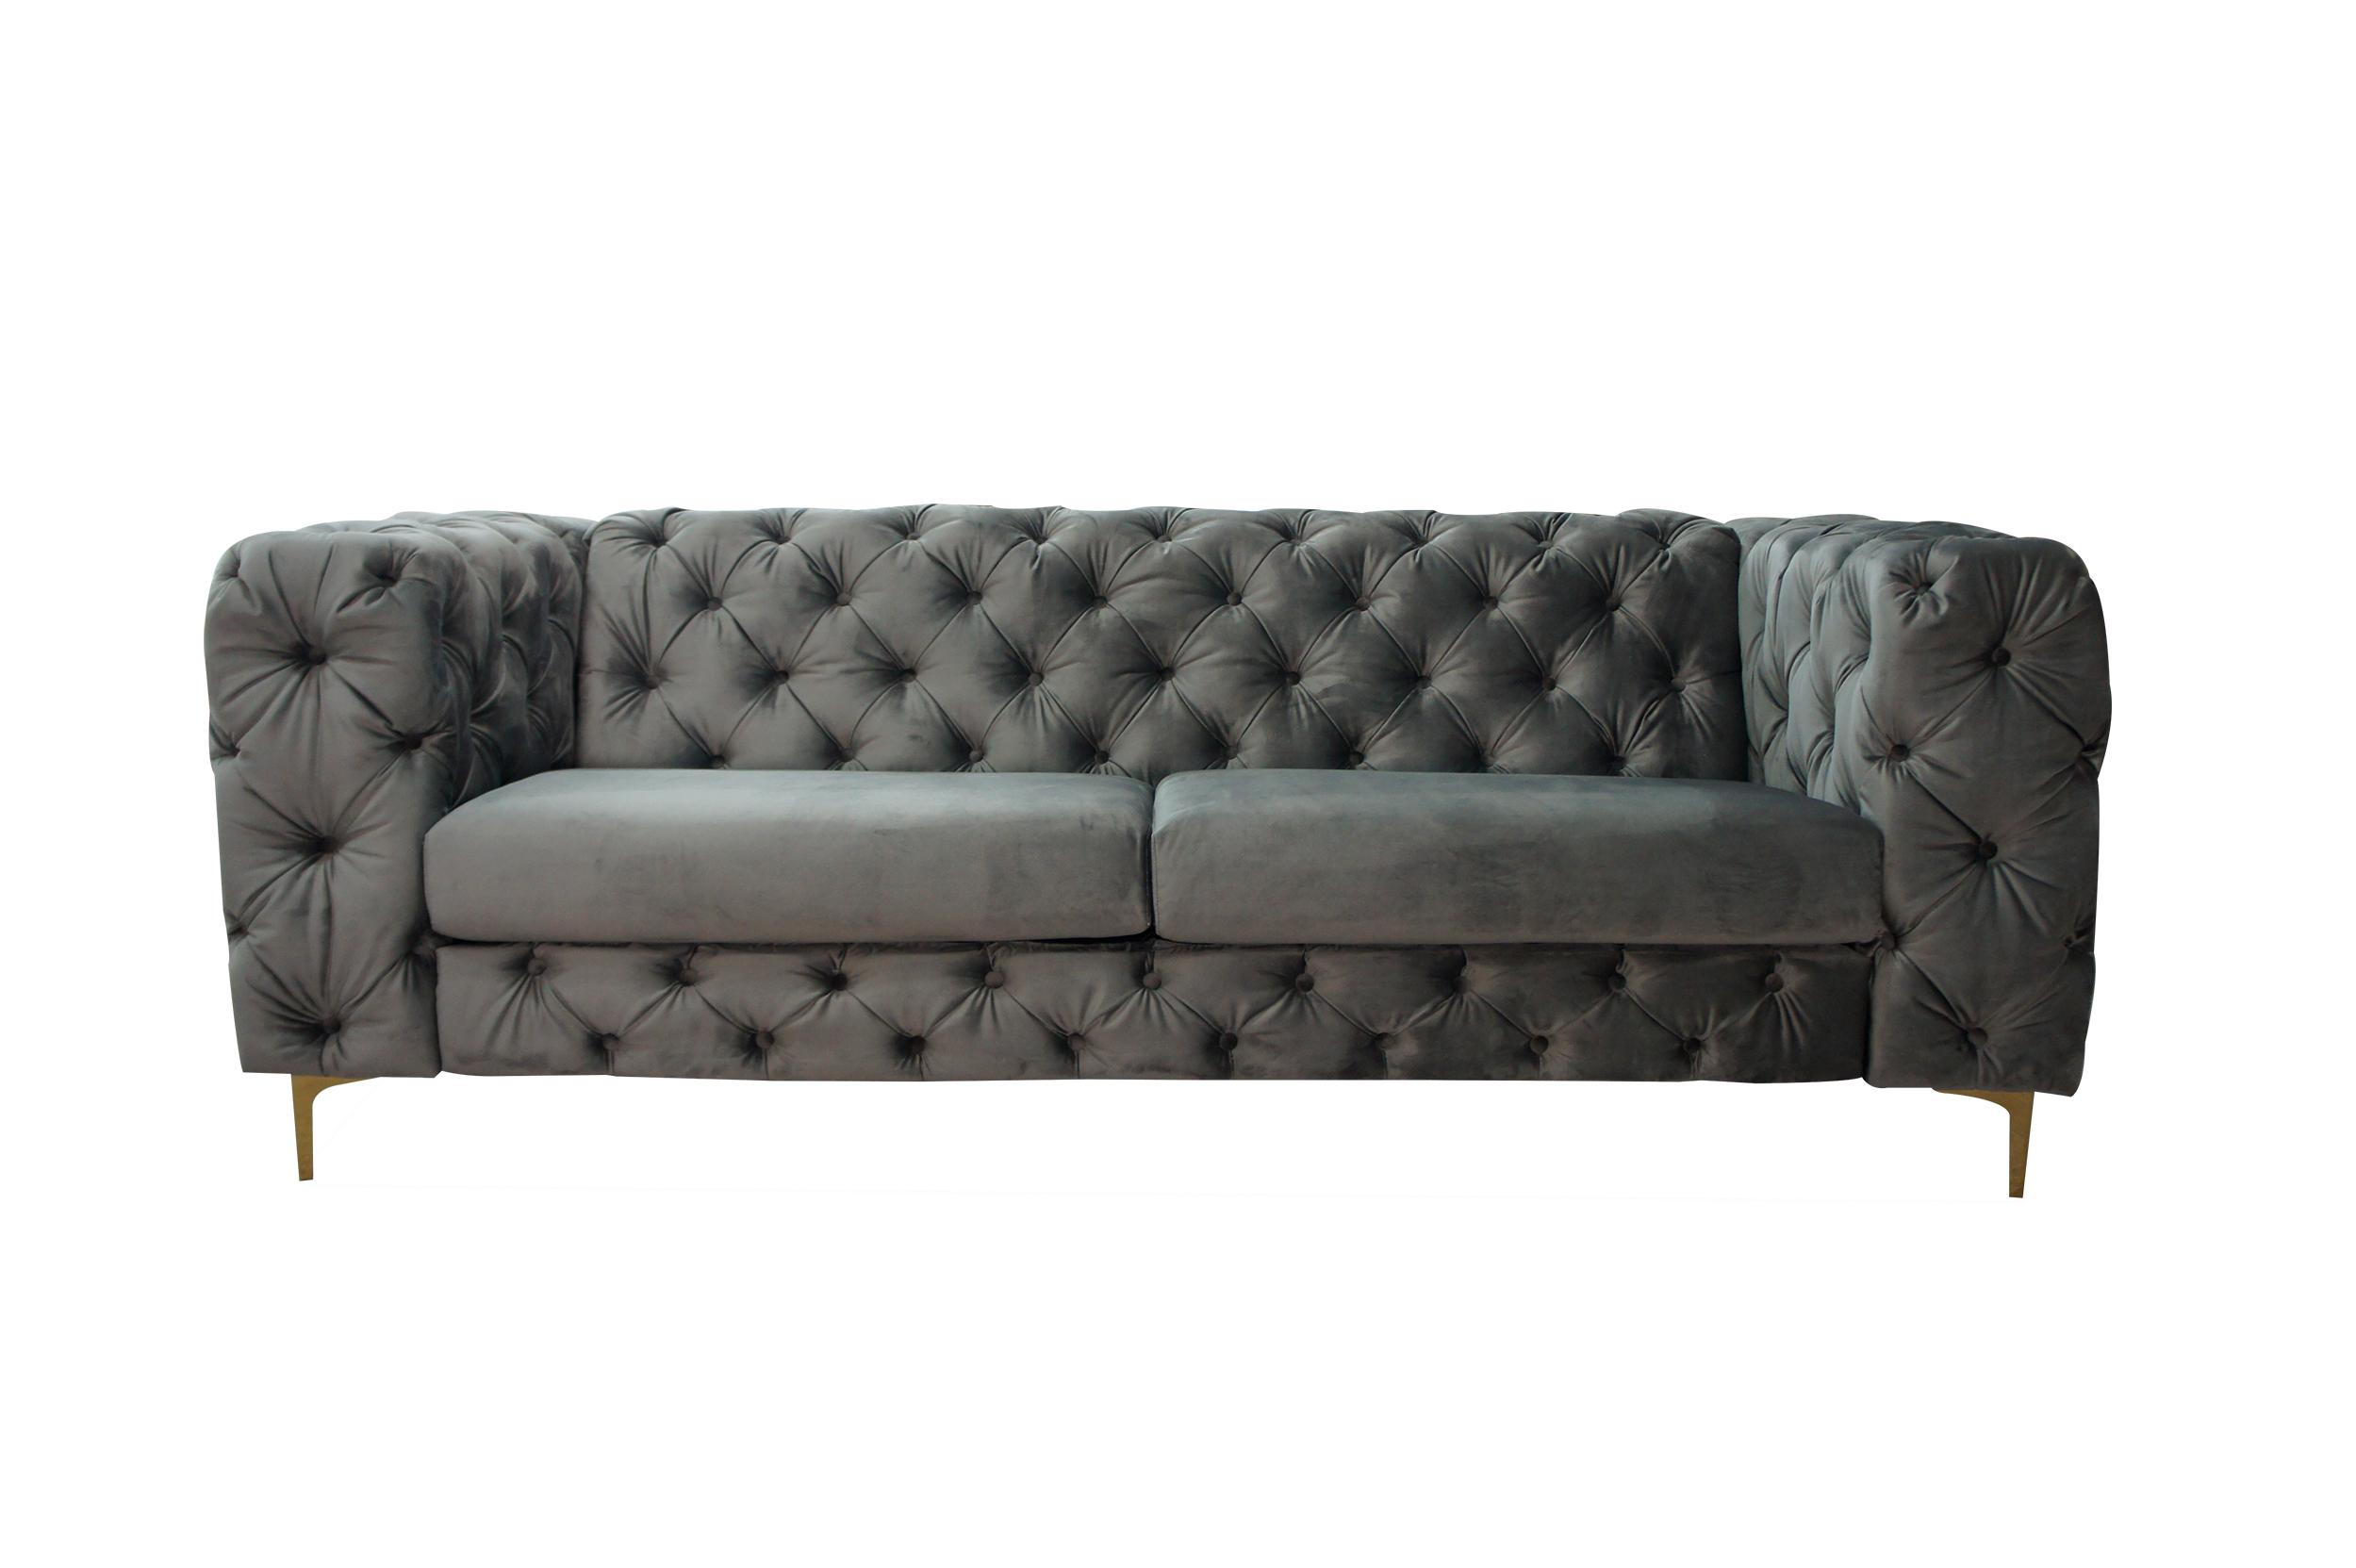 Full Size of Lc Home 3er Sofa Dreisitzer Couch Kingdom Chesterfield Samt Barock Karup überwurf Weiß Grau Relaxfunktion Big Mit Schlaffunktion Günstig Poco 3 Sitzer Bezug Sofa Chesterfield Sofa Grau